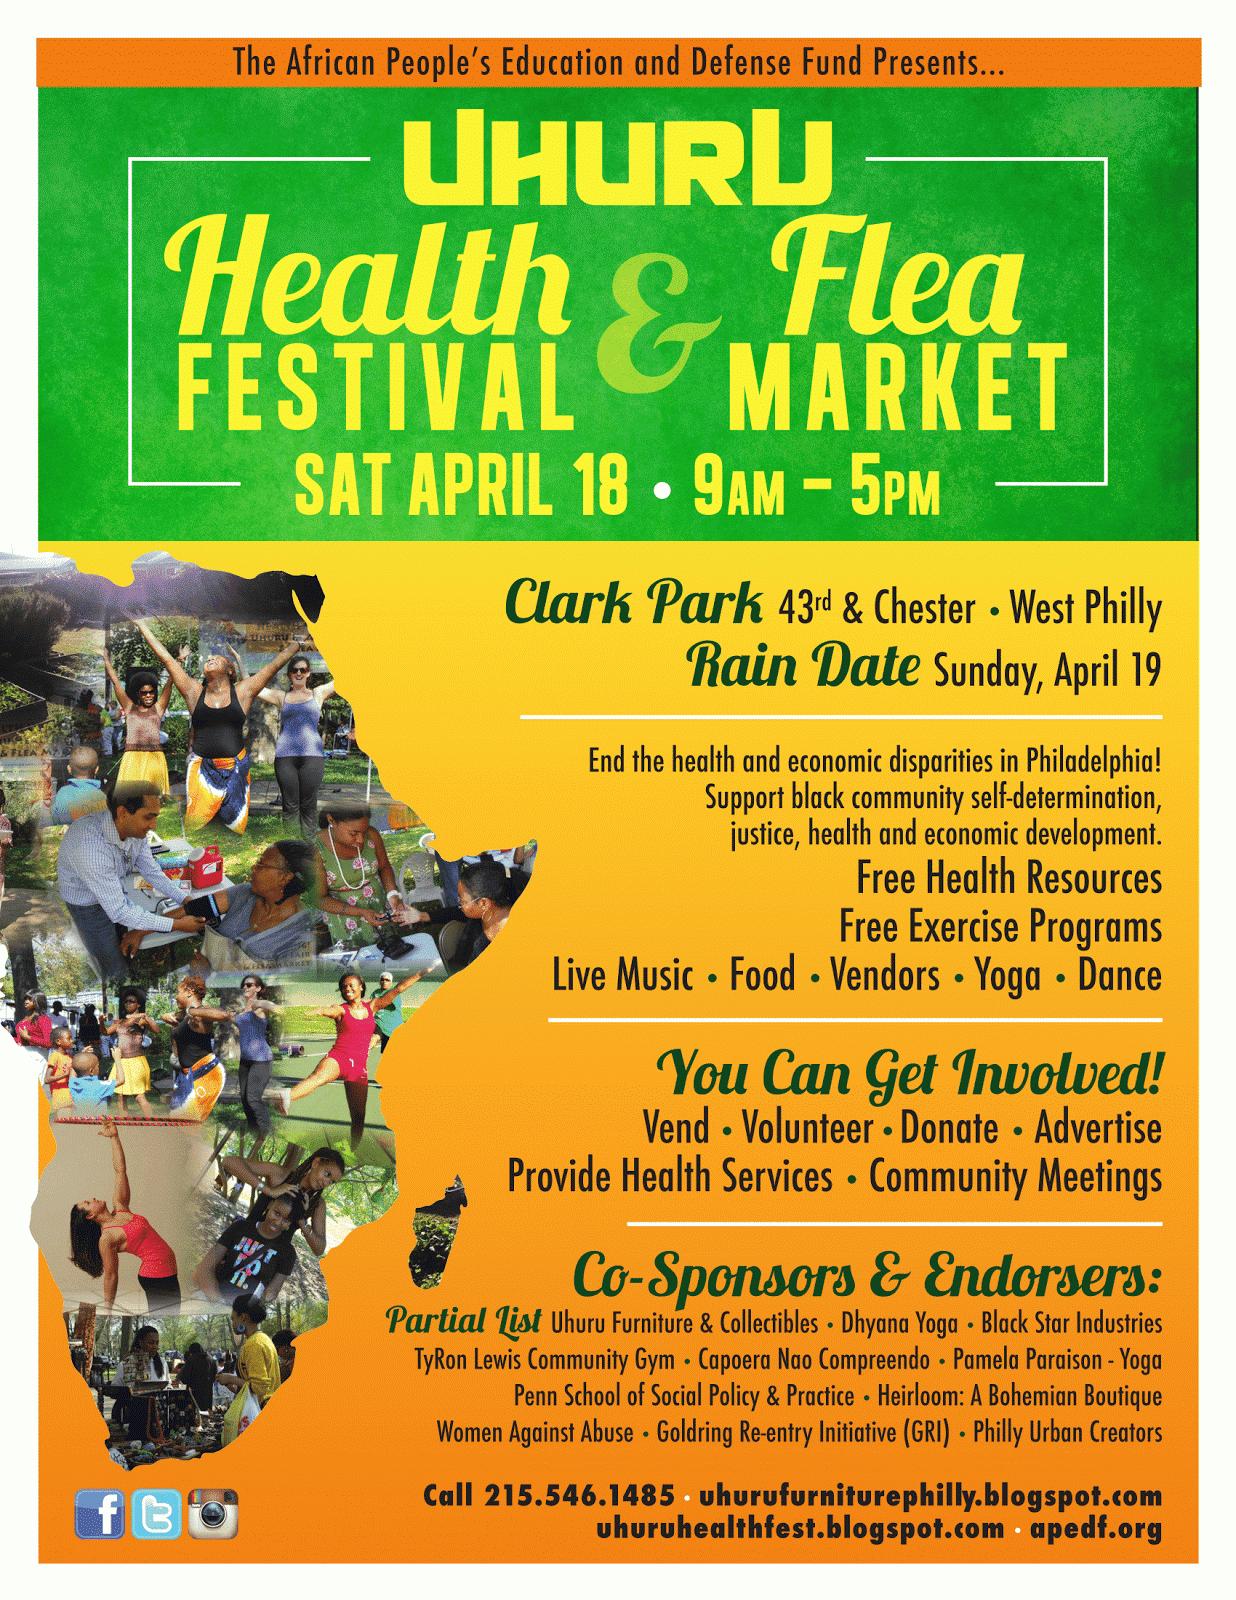 2015 Uhuru Health Festival & Flea Market!